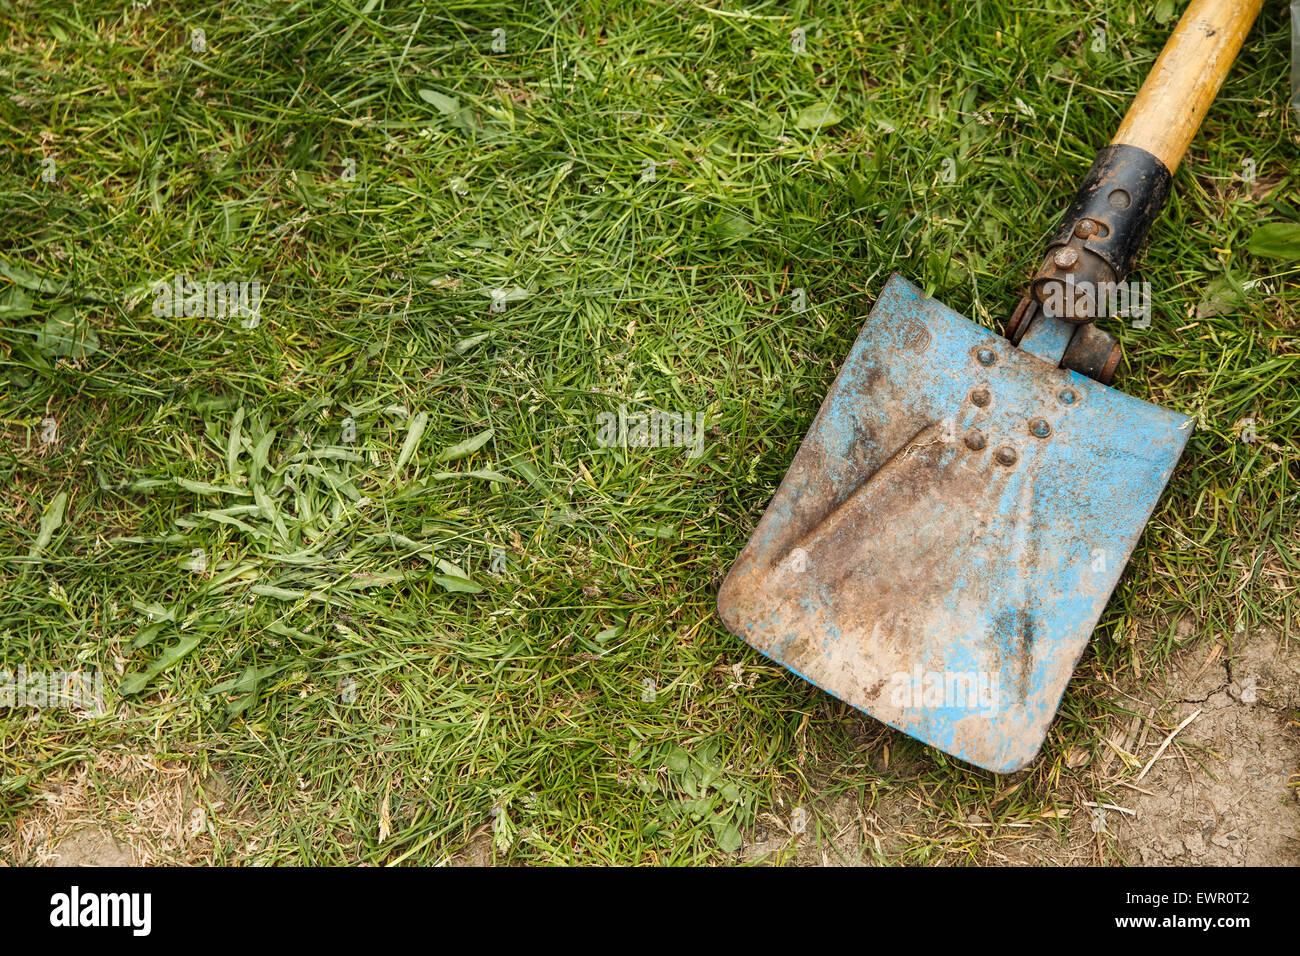 Blue rusty spade on grass - Stock Image